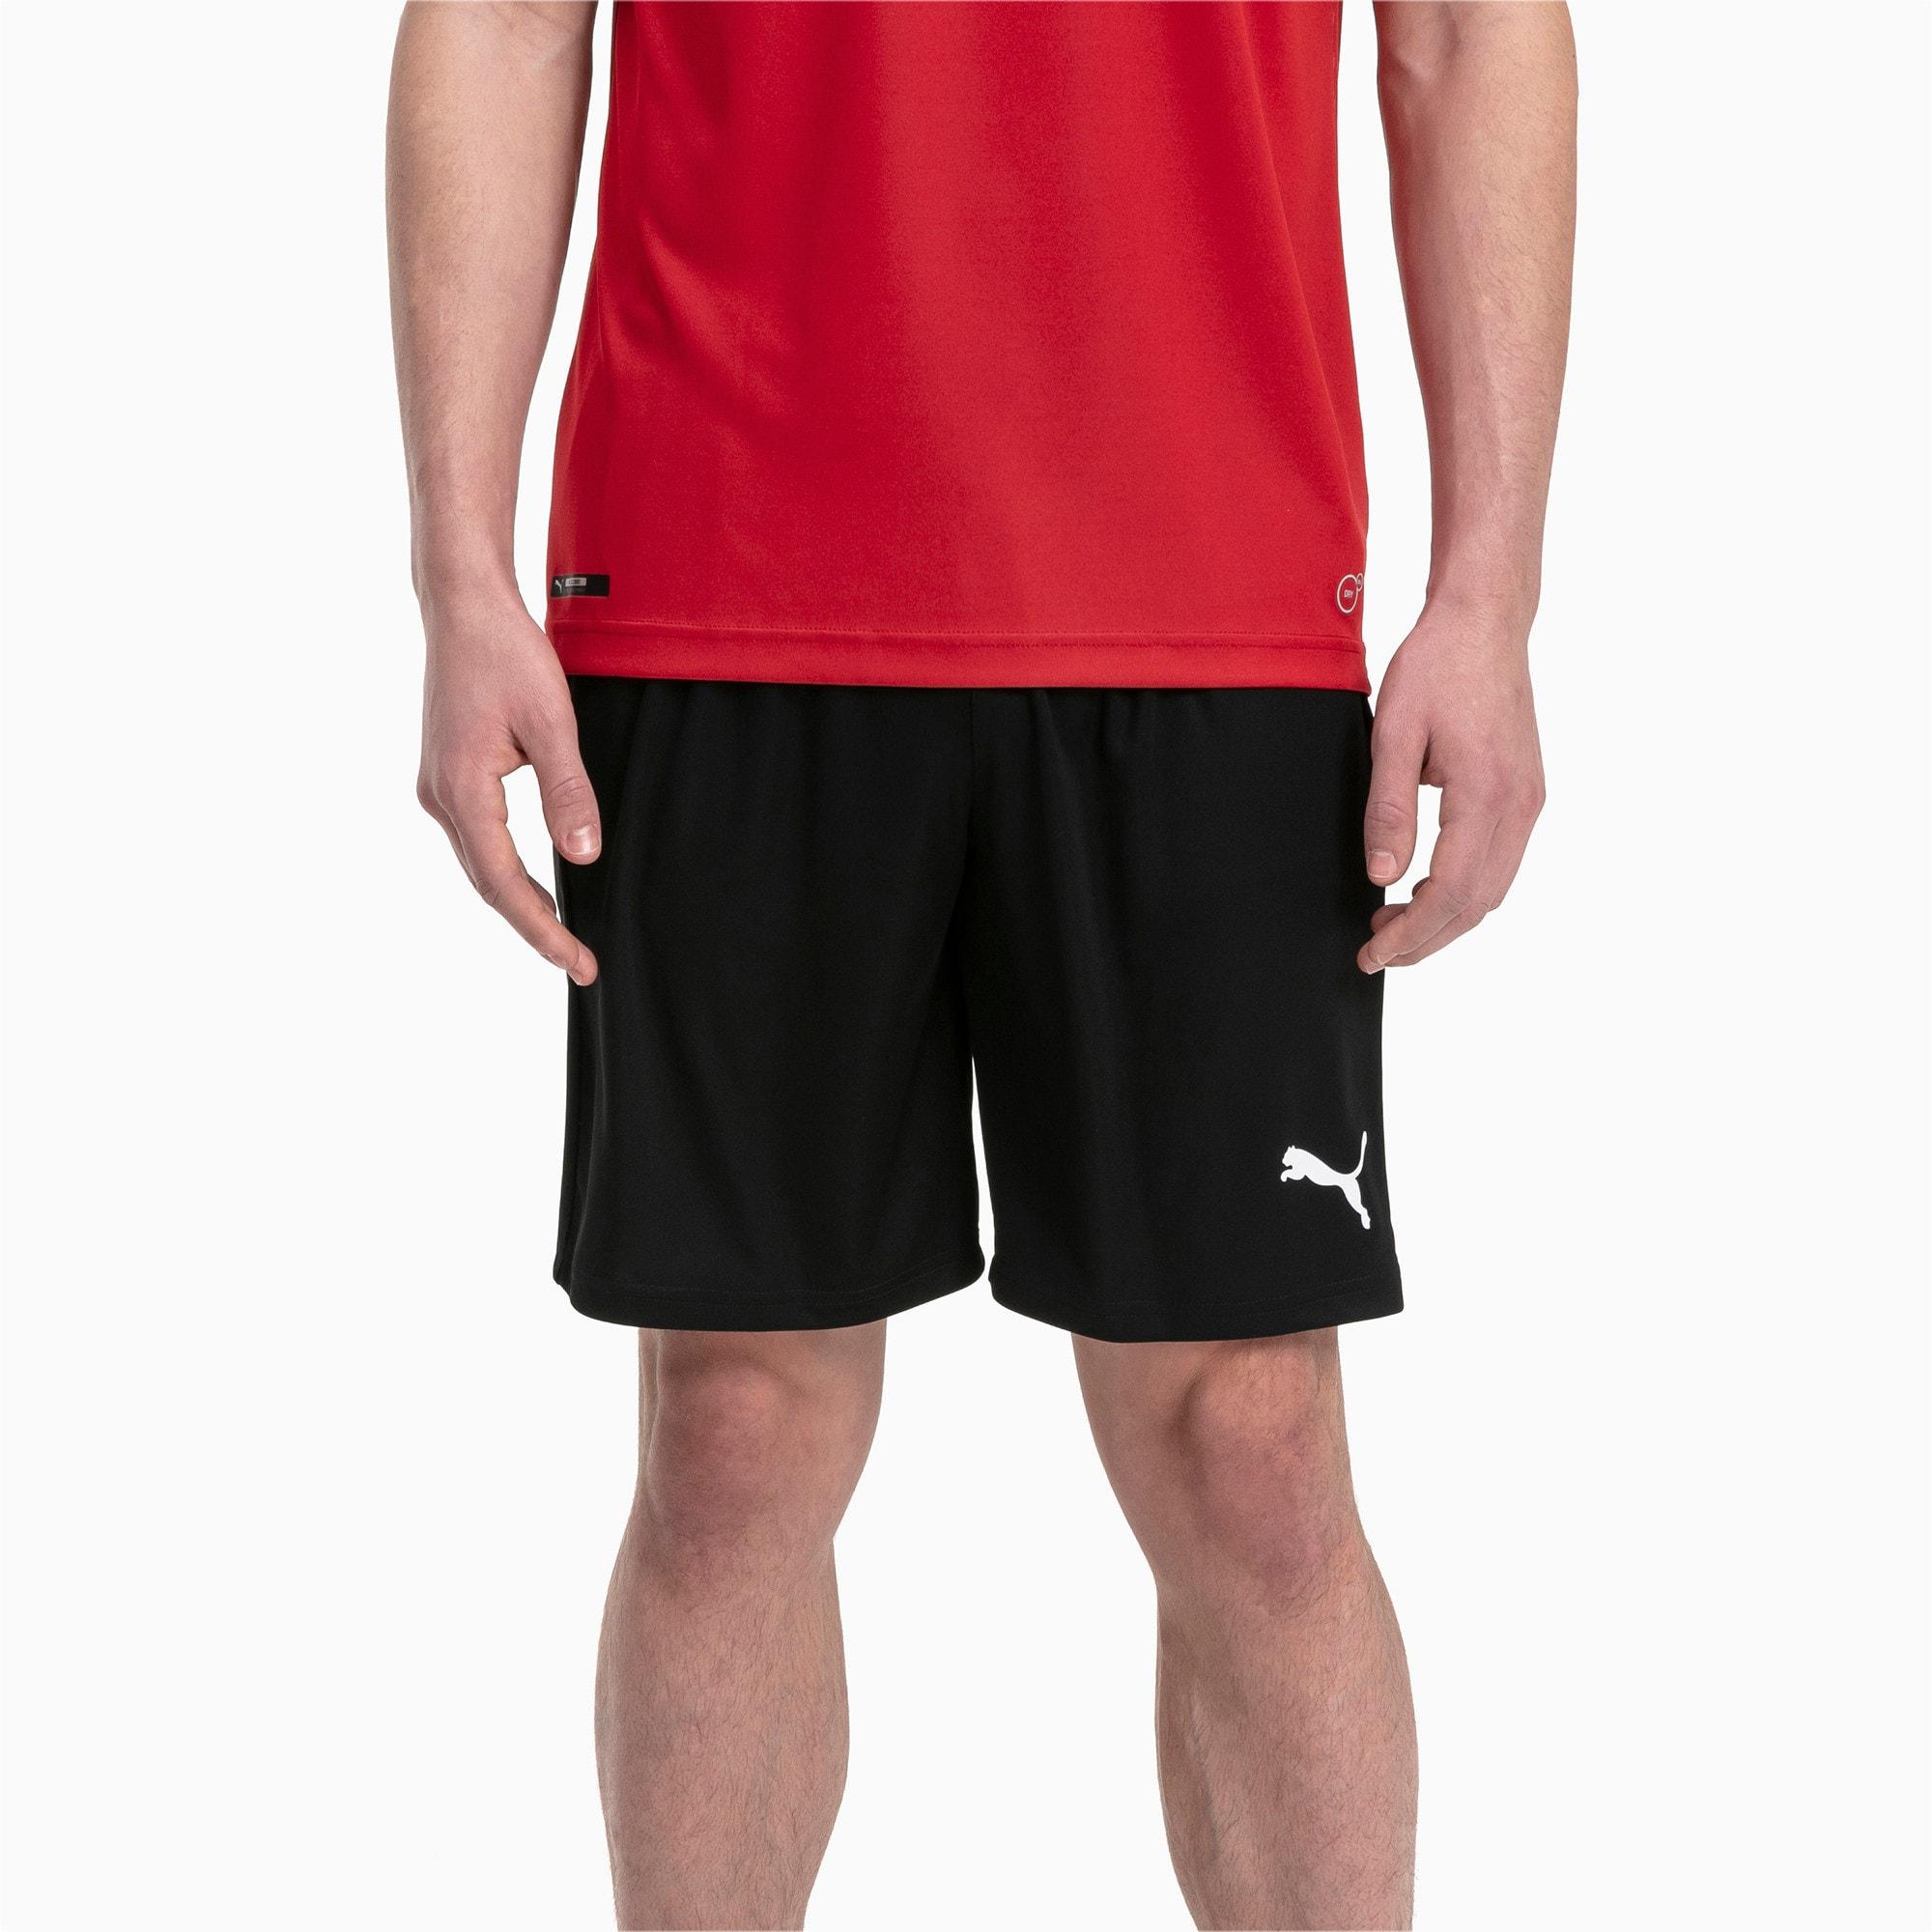 Thumbnail 1 of Liga Core Men's Shorts, Puma Black-Puma White, medium